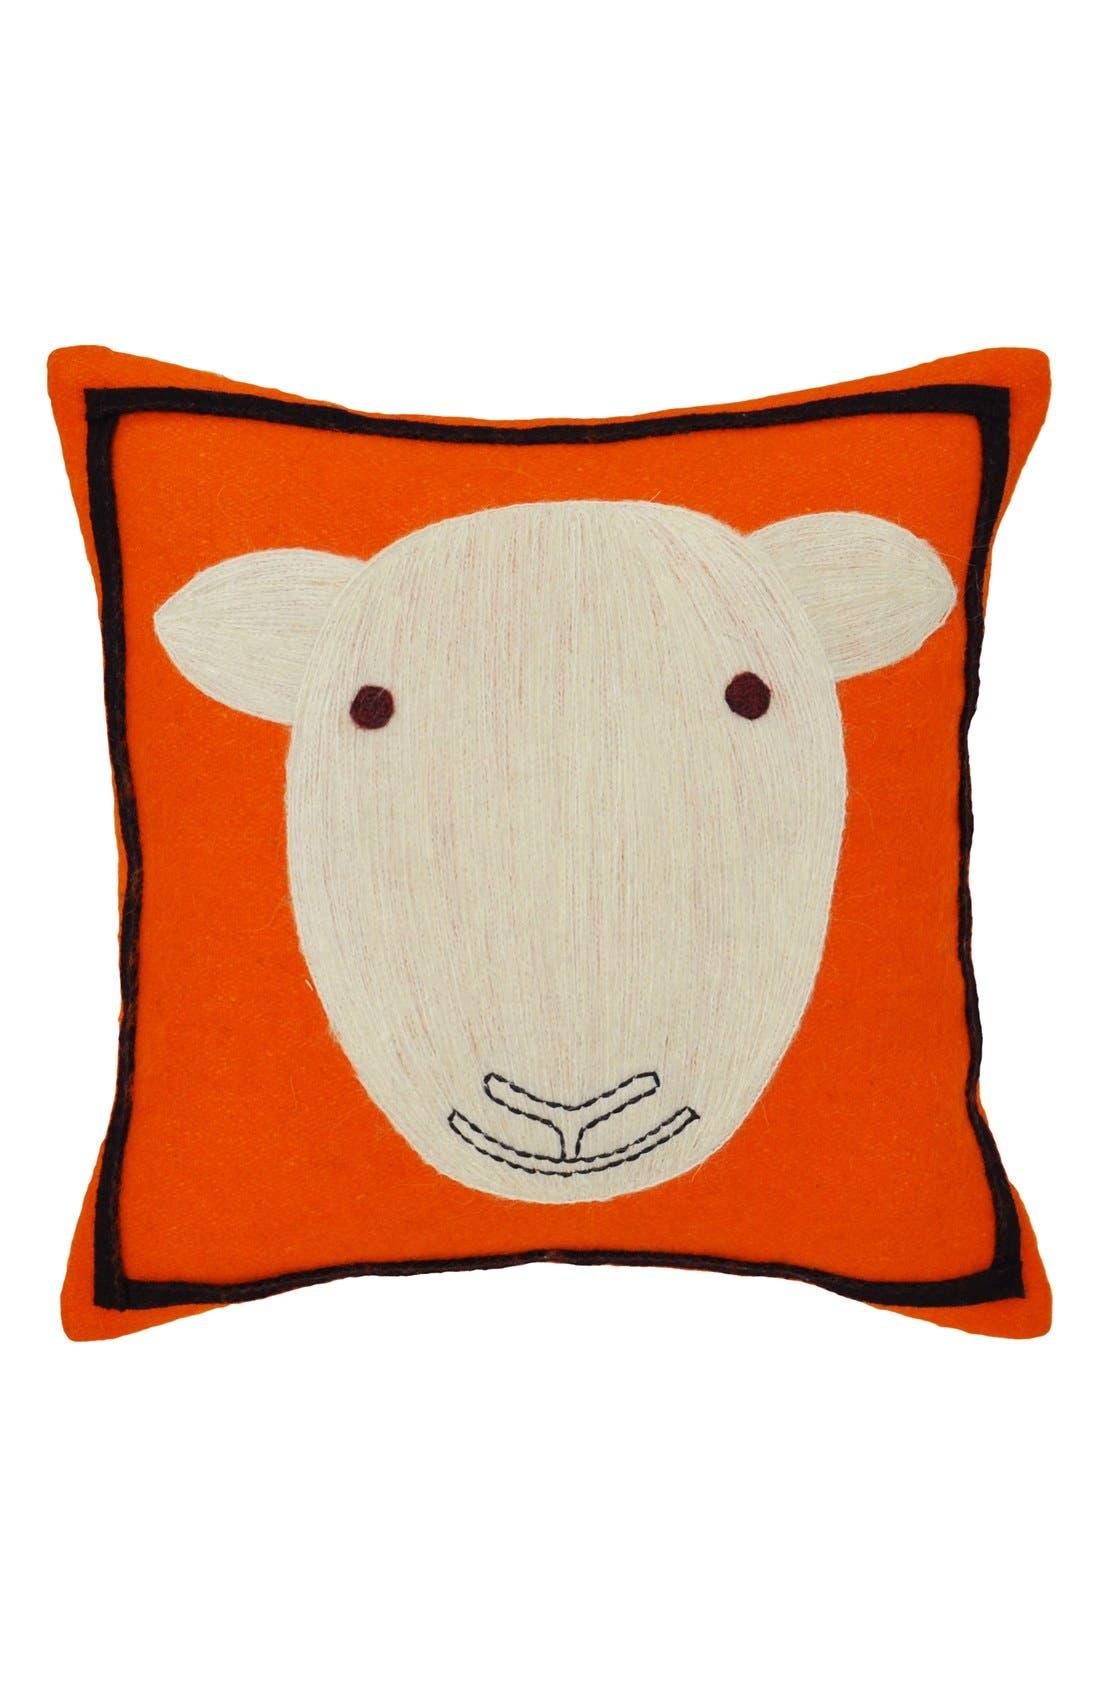 Main Image - Amity Home Sheep Decorative Pillow